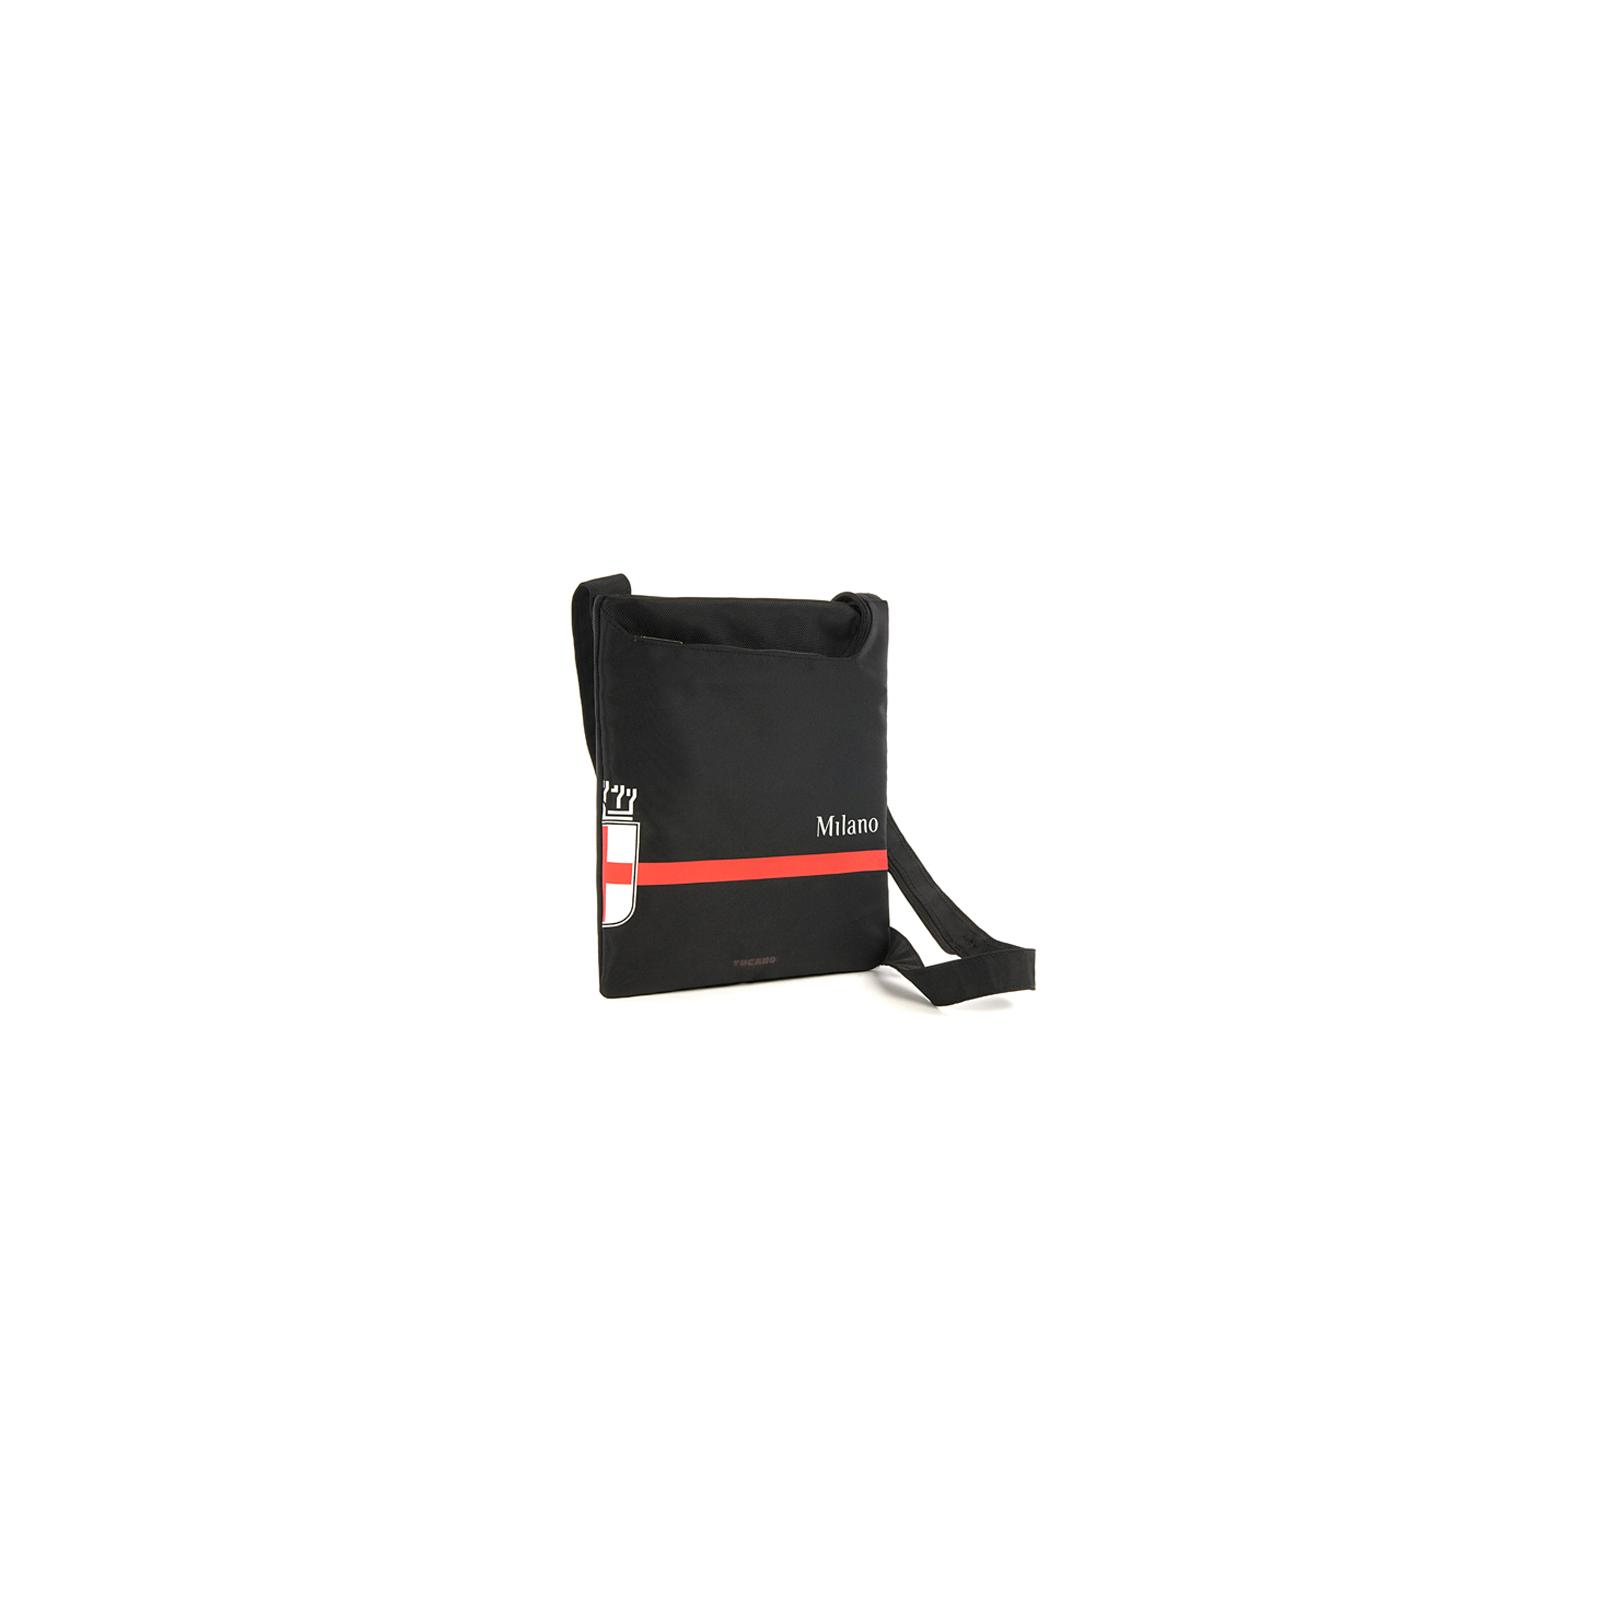 Чехол для планшета Tucano iPod Finatex City Milano /Black (MIBFITCI-G) изображение 2